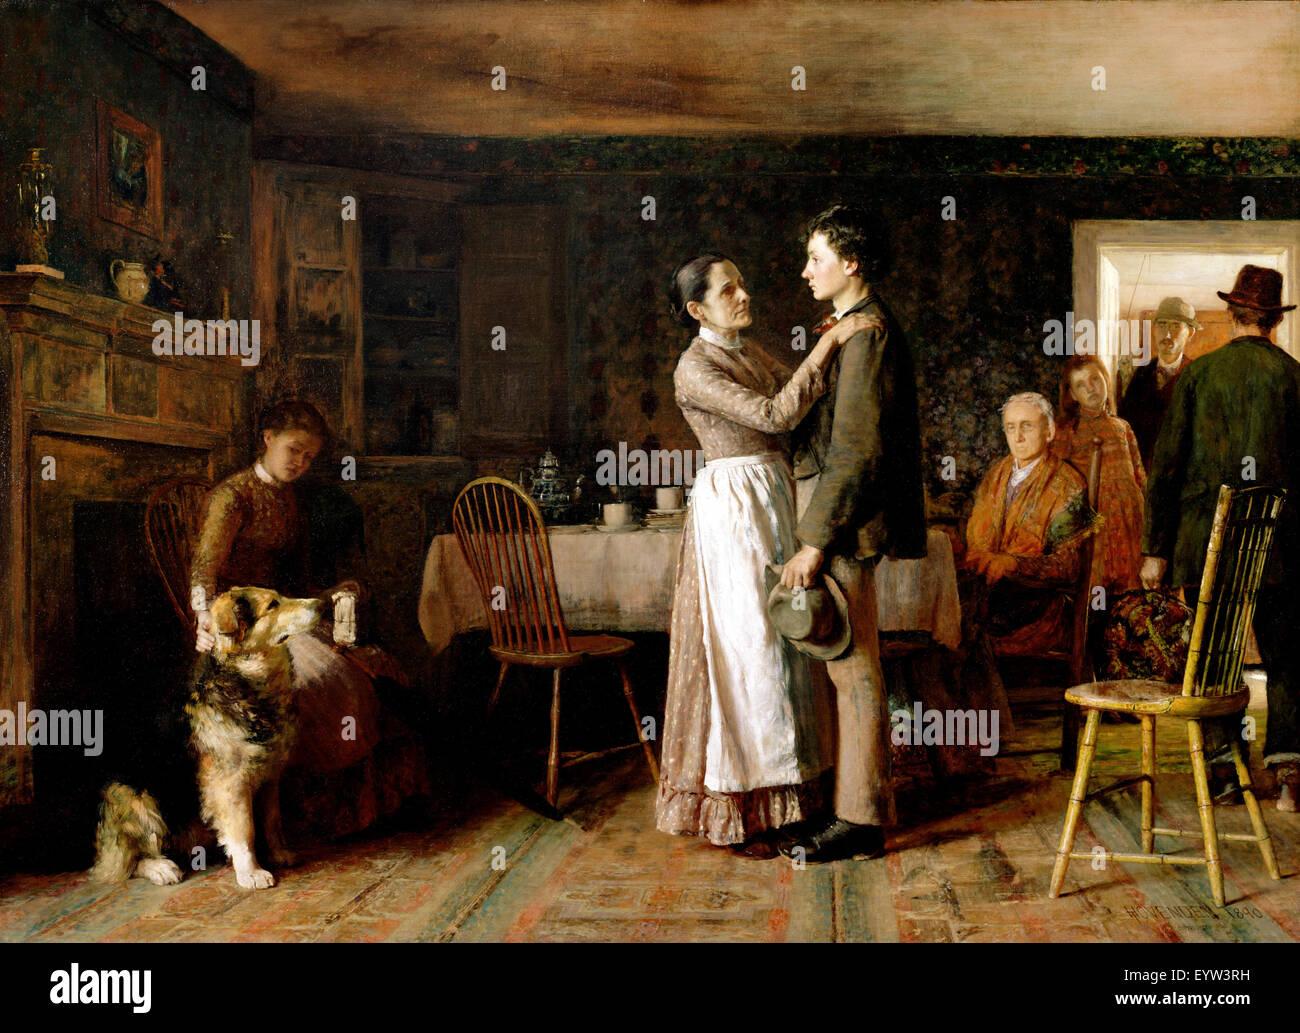 Thomas Hovenden, brechen nach Hause Beziehungen 1890-Öl auf Leinwand. Philadelphia Museum of Art, USA. Stockbild